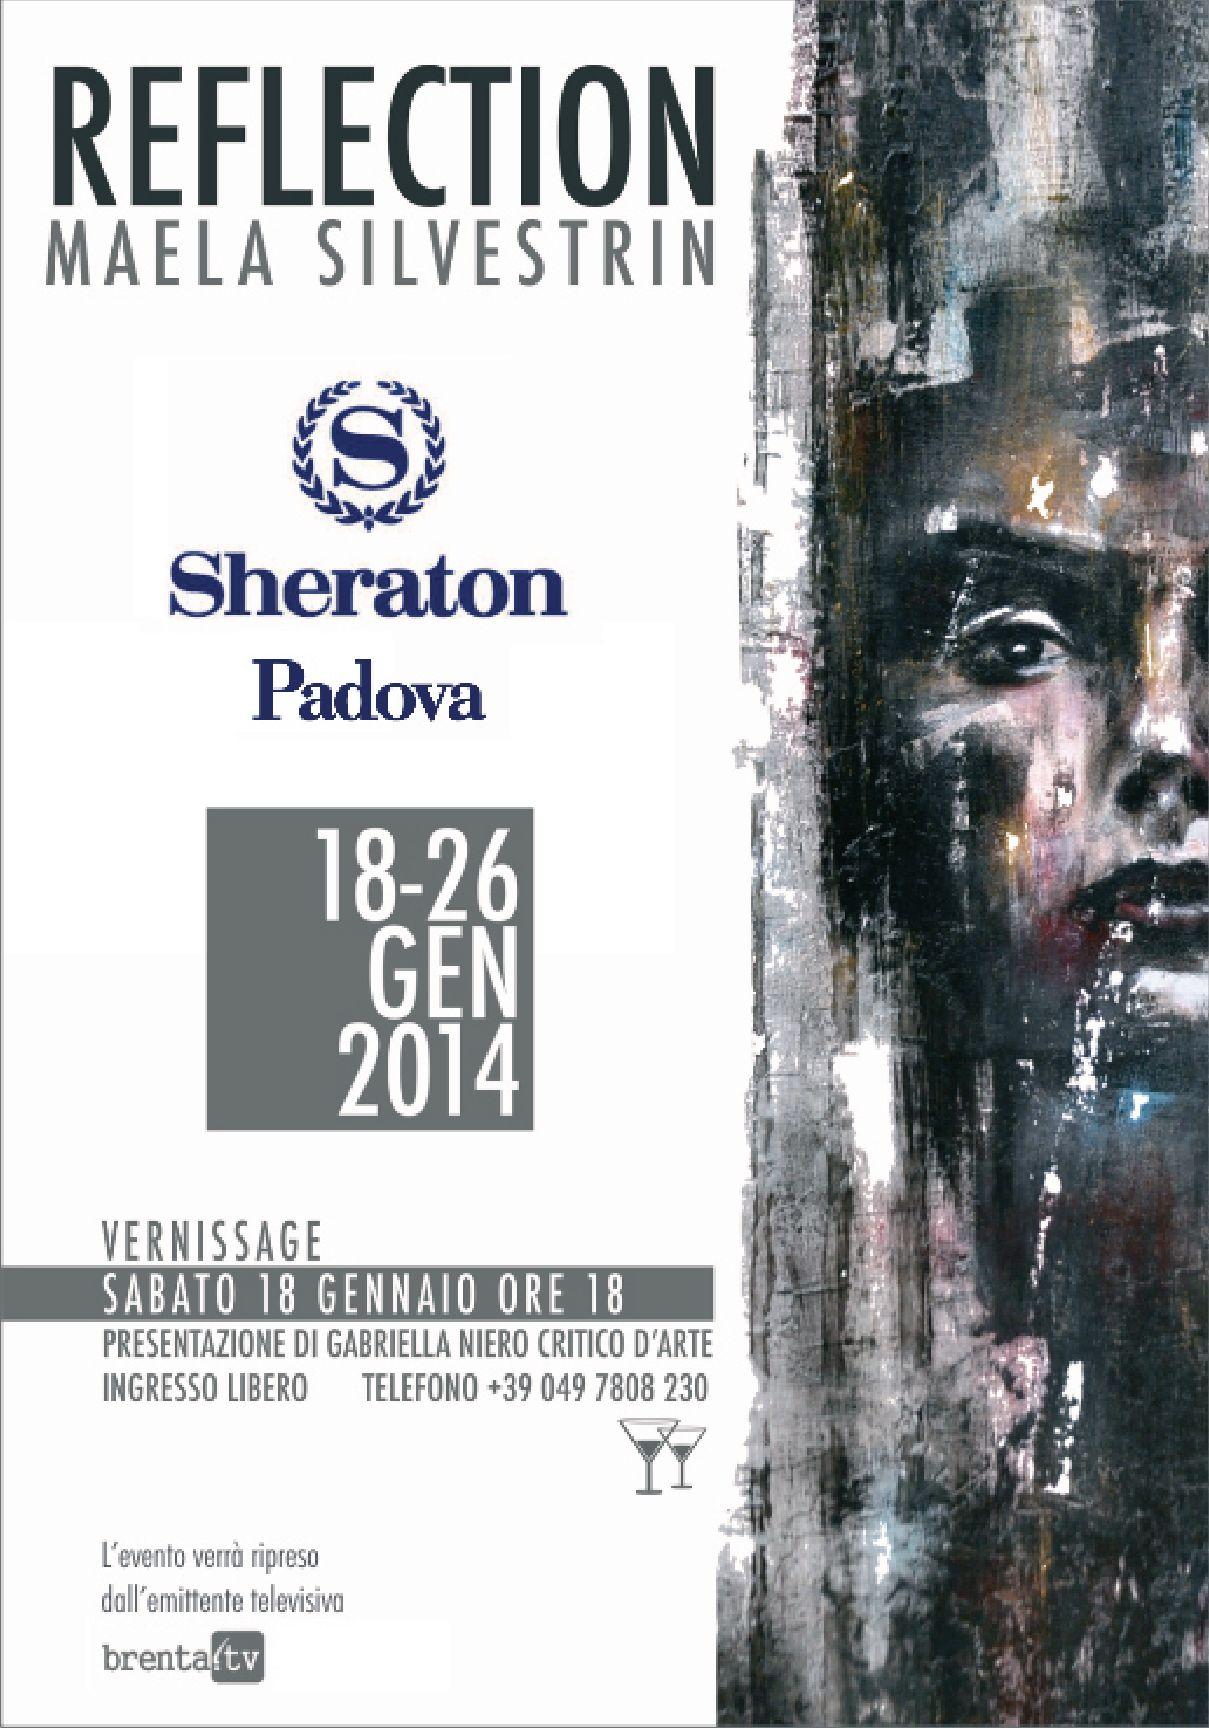 Maela Silvestrin